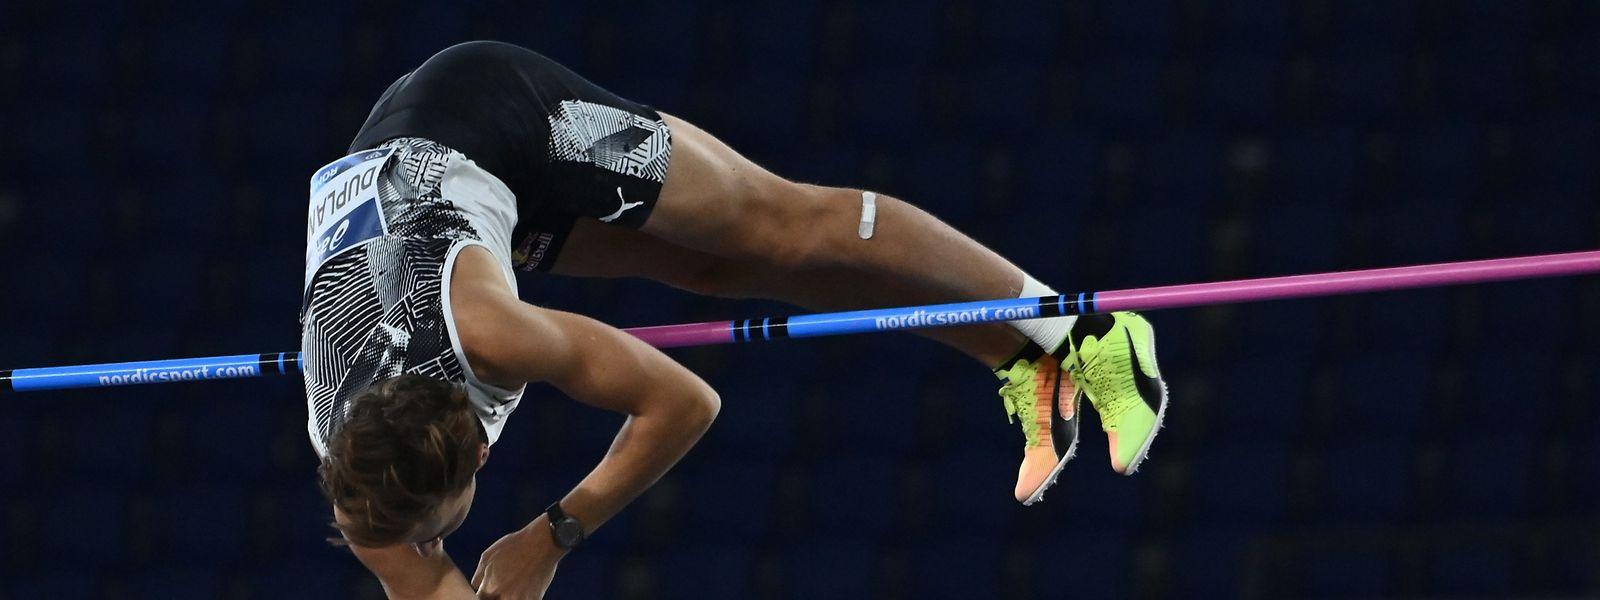 Immer höher: Armand Duplantis überspringt 6,15 m.